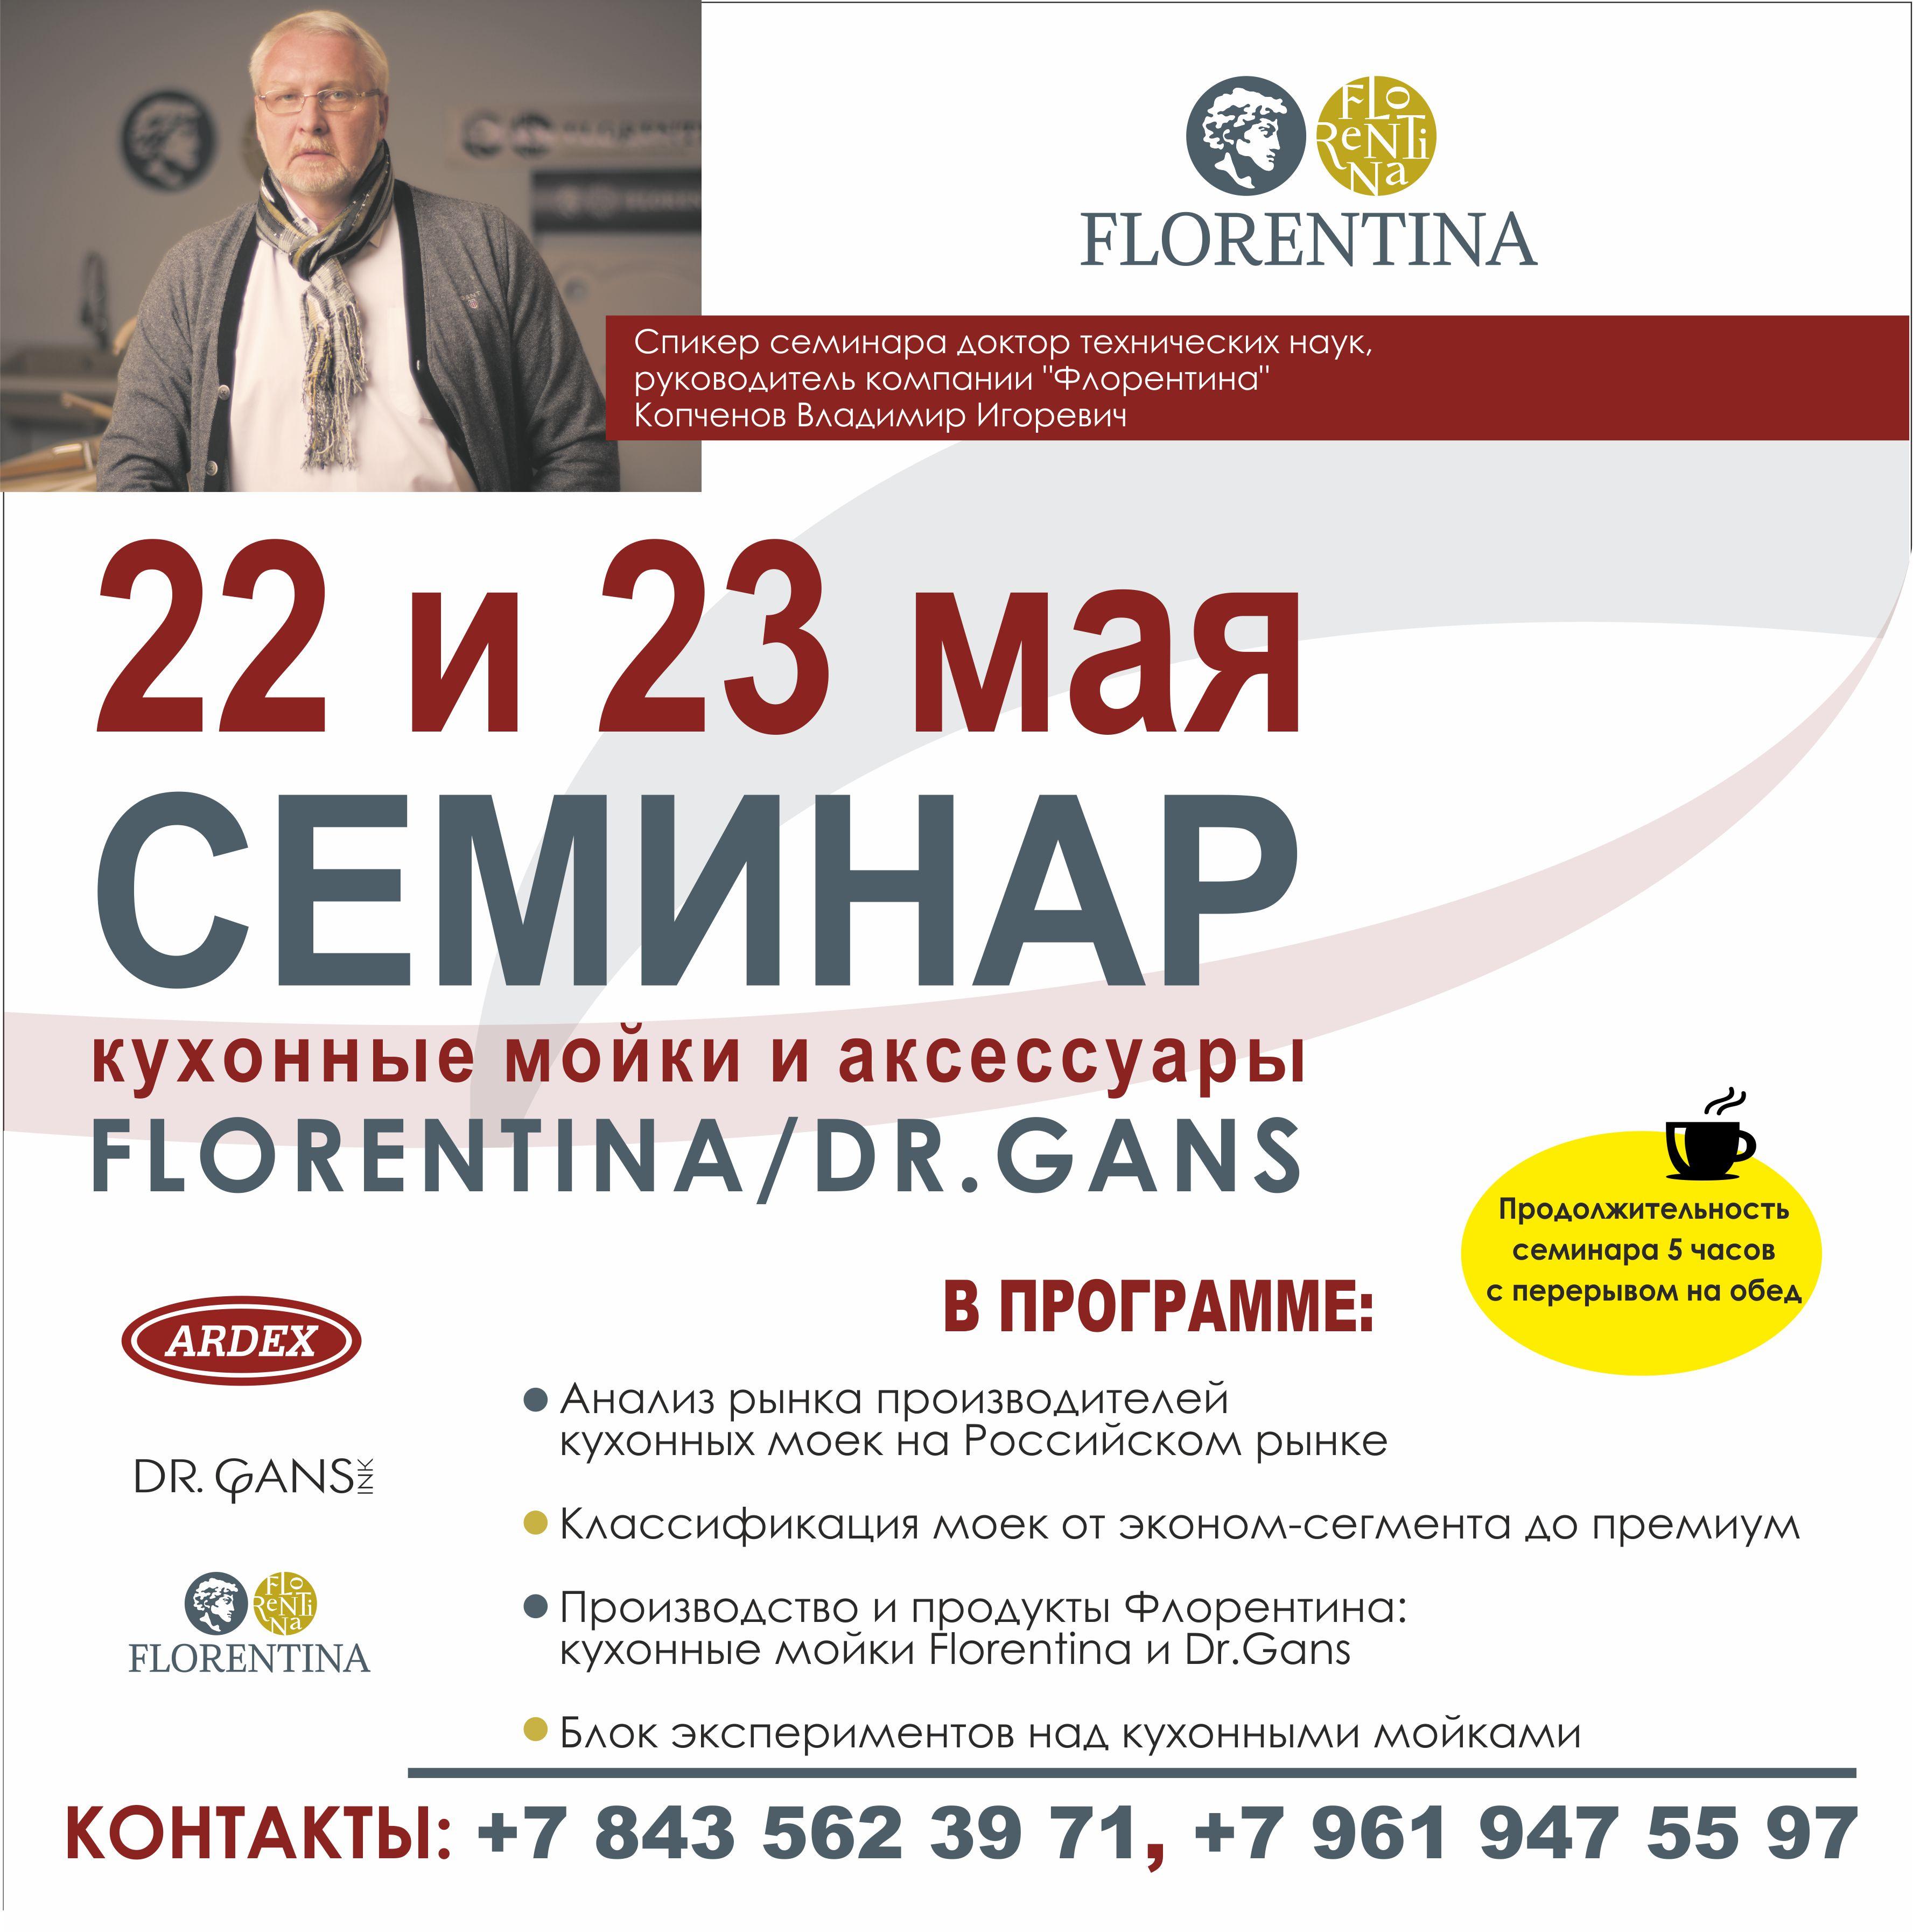 СЕМИНАР FLORENTINA/ DR.GANS